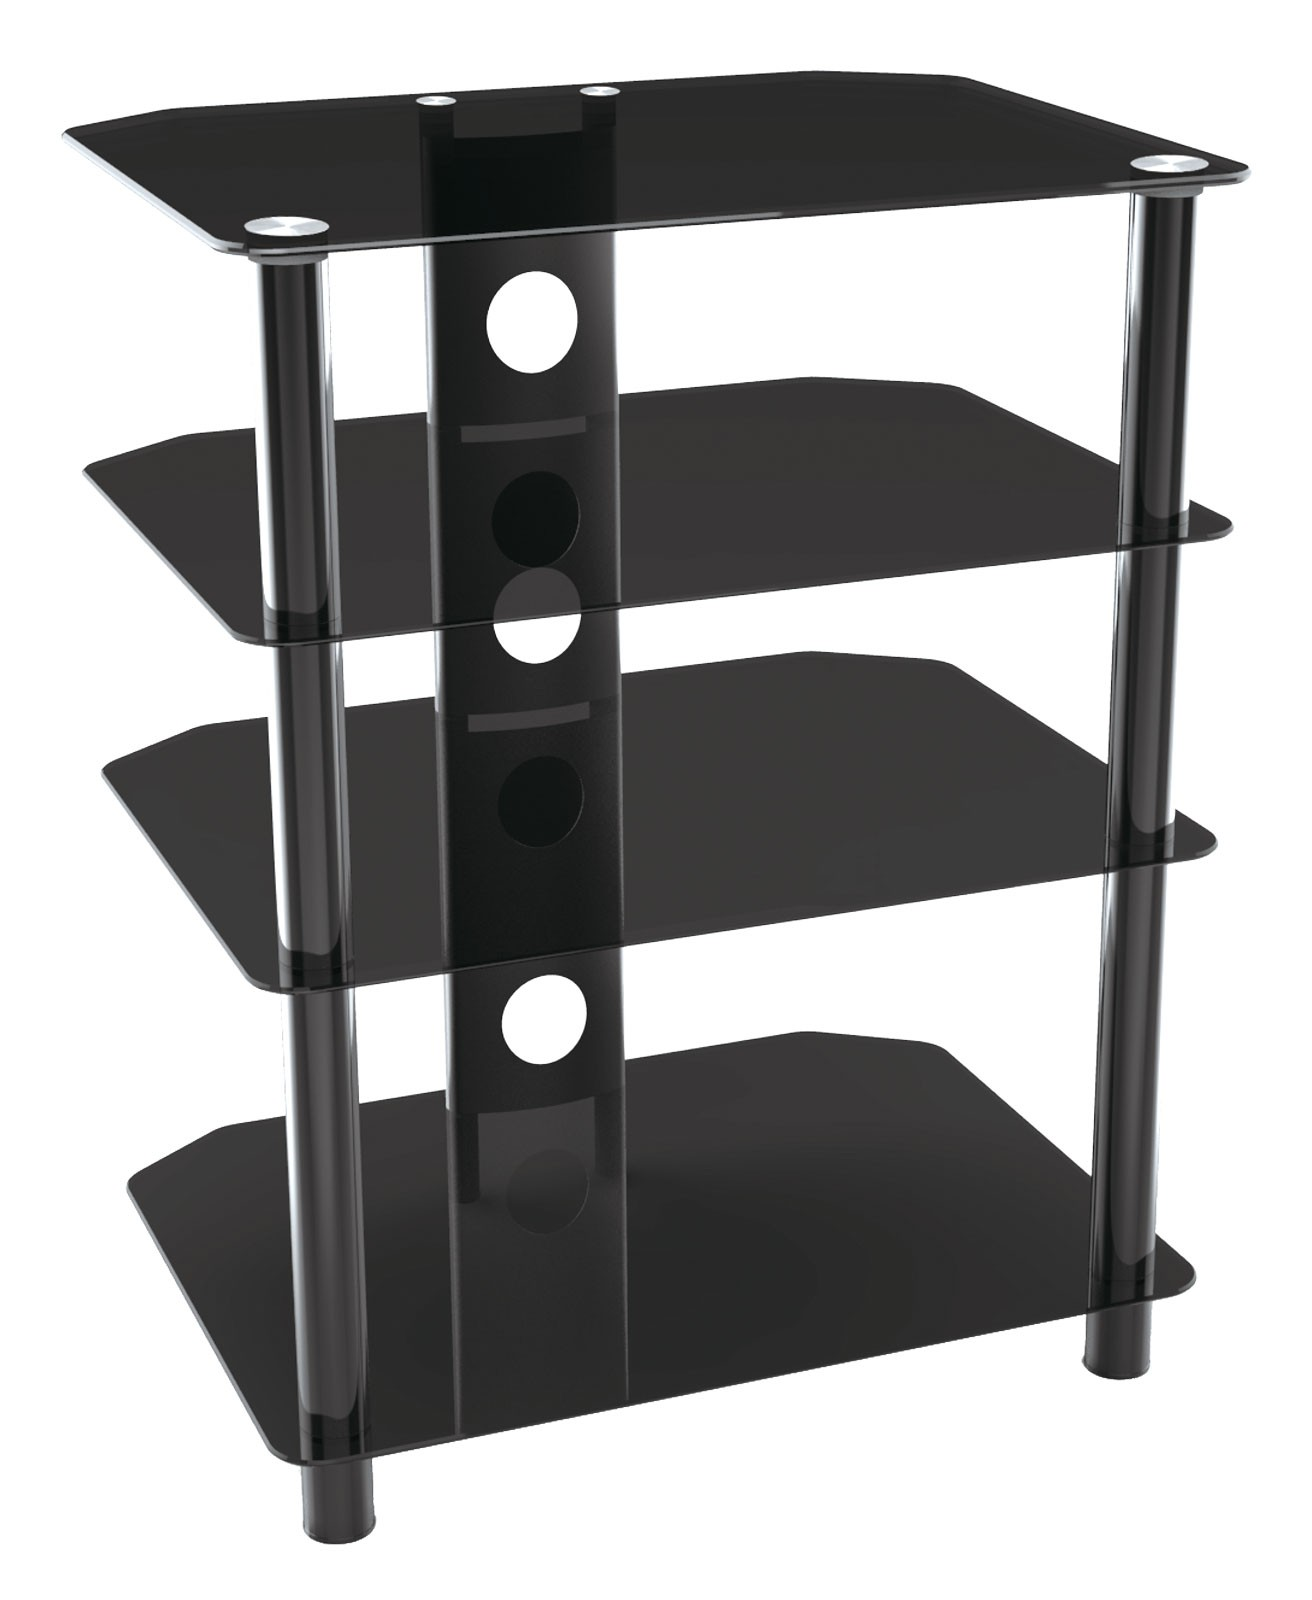 Full Size of Tv Regal Holz Regali Za Forma Ideale Ikea Lesnina Matis Stand Mit 4 Ablagen Glas Fr Led Lcd Ft601 11255 Weis Modular Regale Kinderzimmer Zum Aufhängen 80 Cm Regal Tv Regal